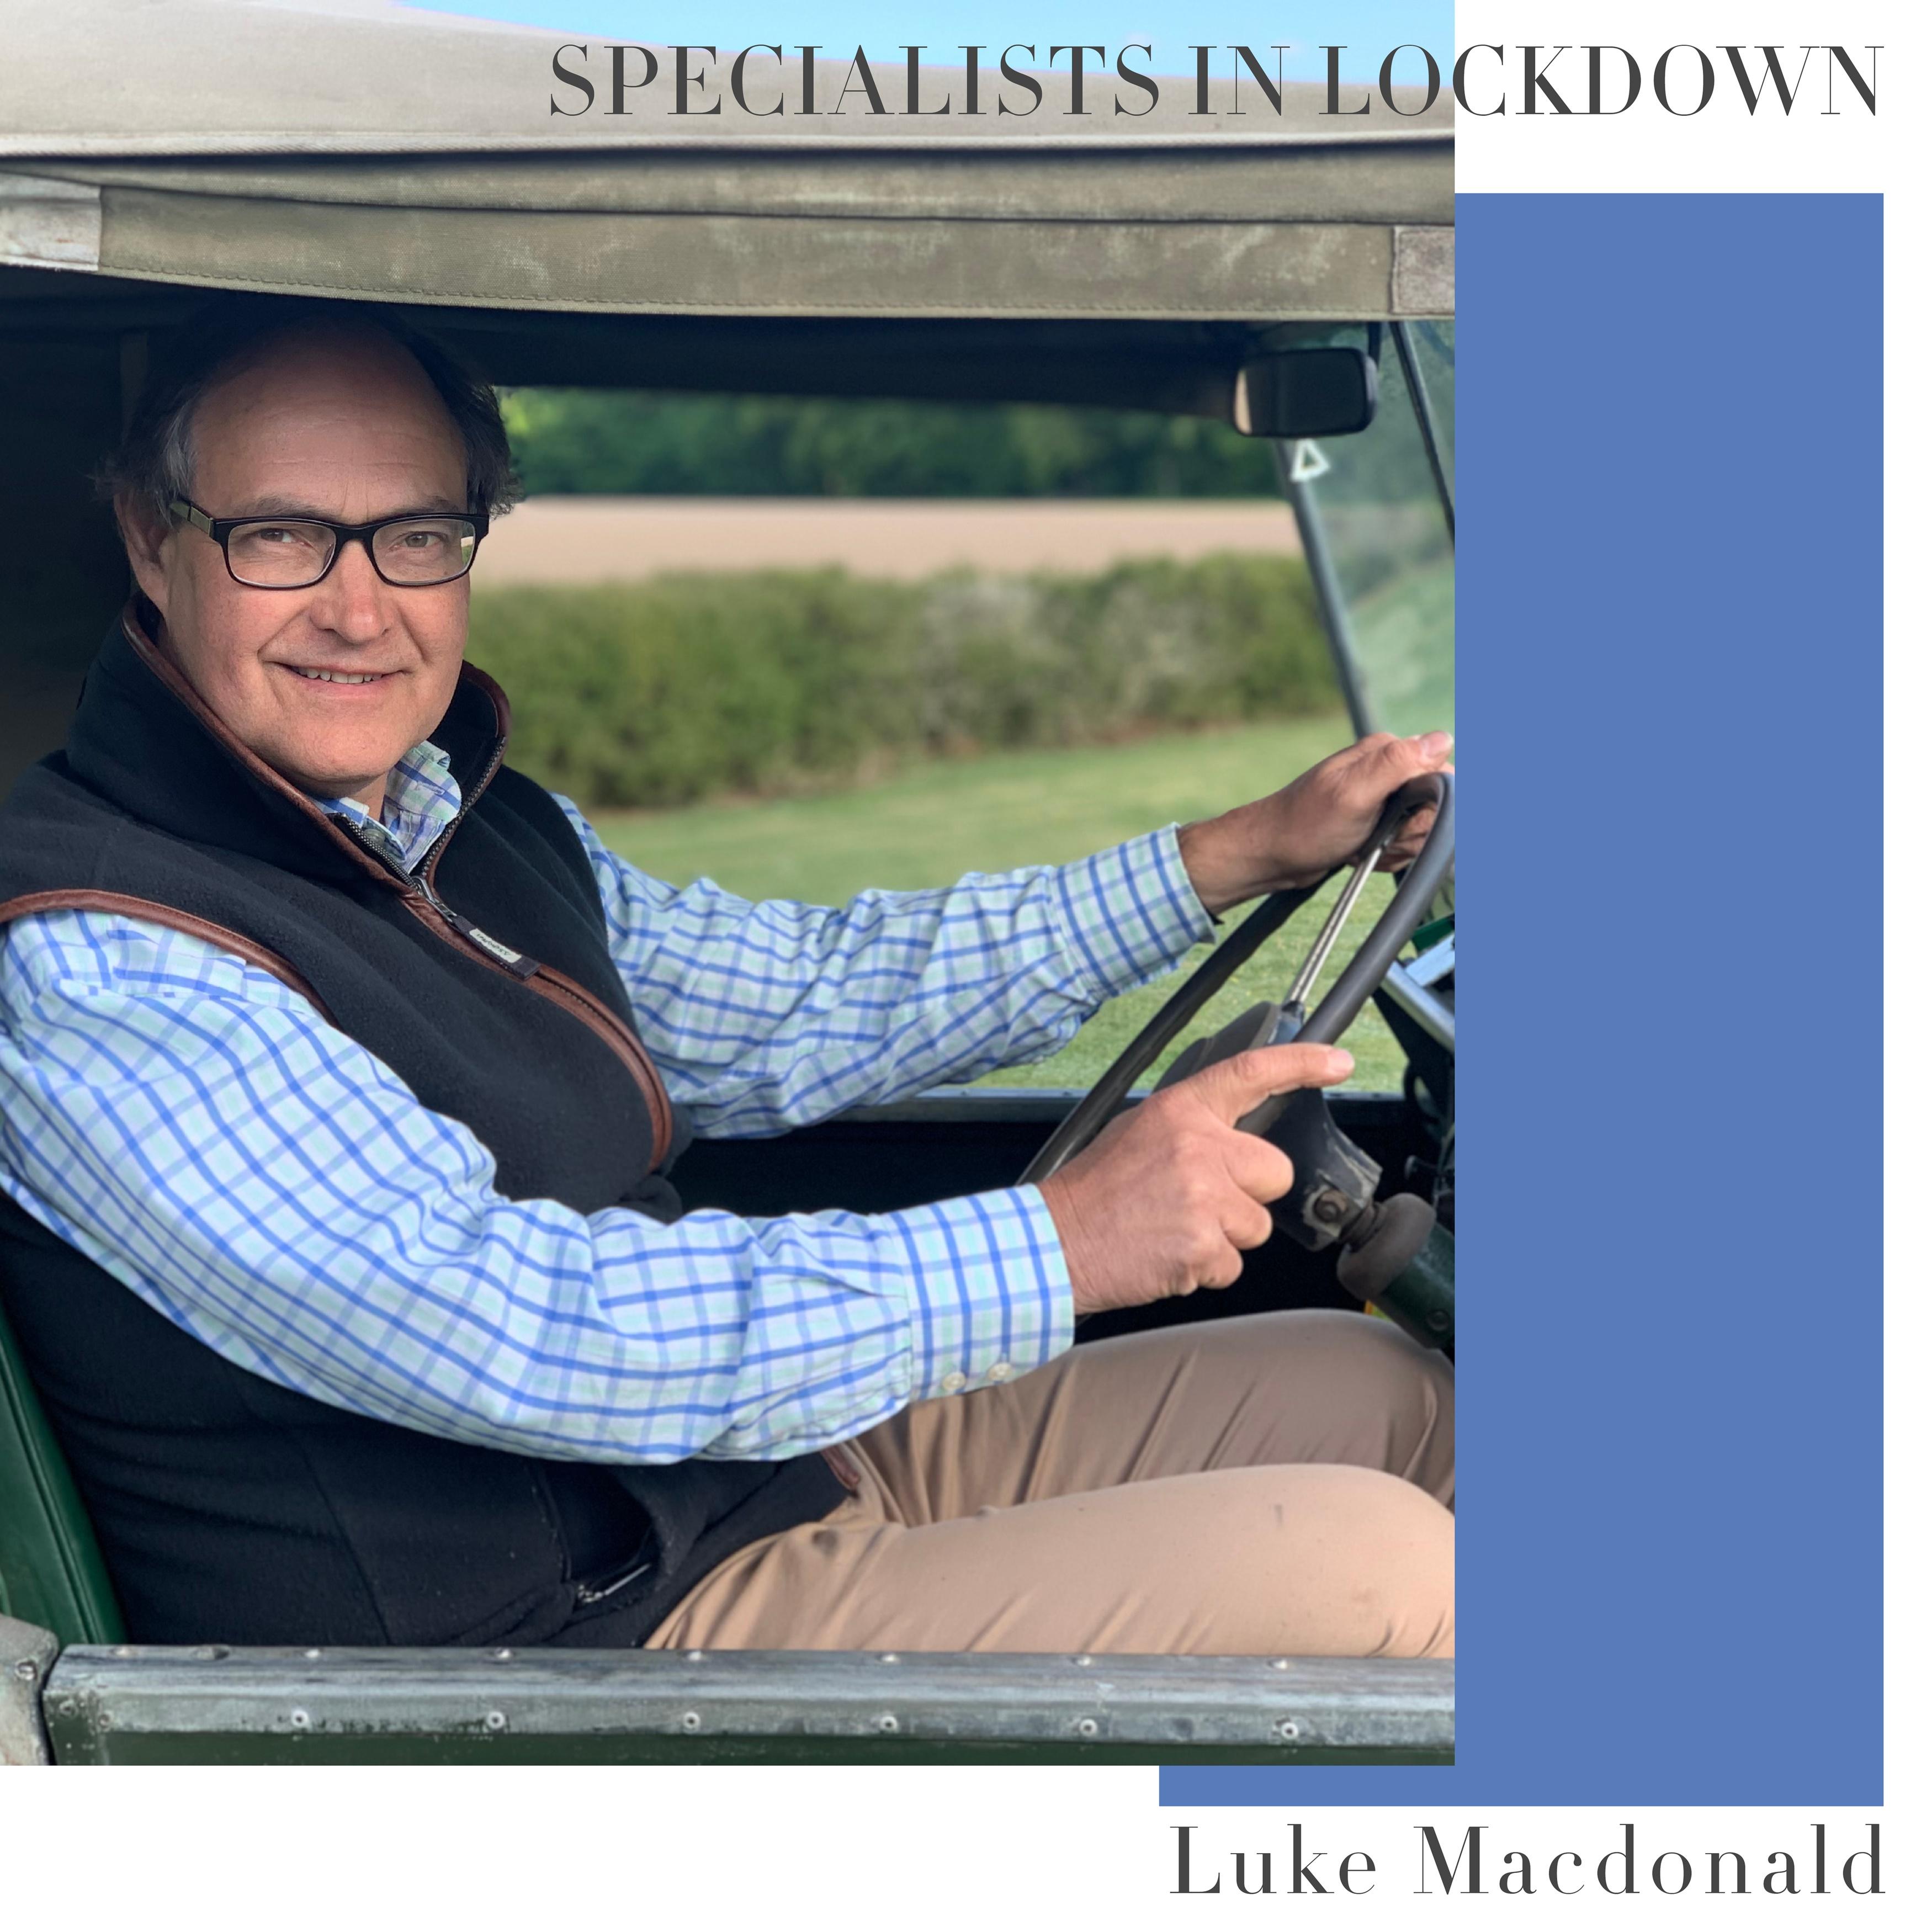 Luke Macdonald